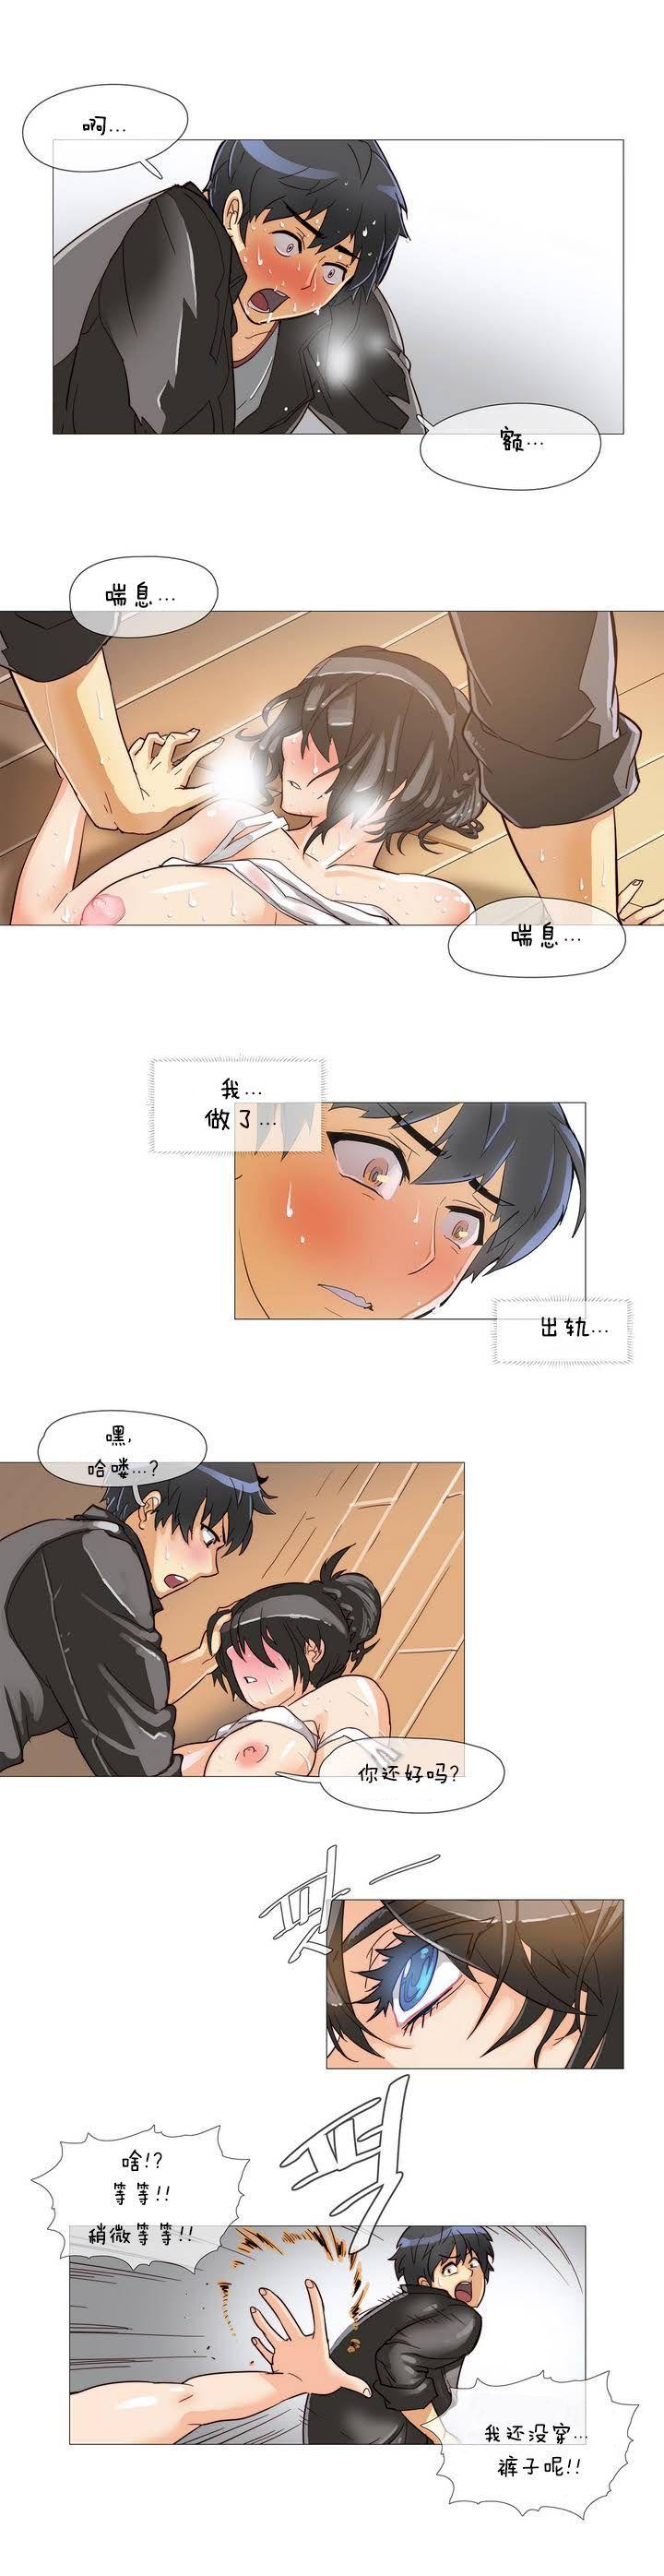 HouseHold Affairs 【卞赤鲤个人汉化】1~33话(持续更新中) 7